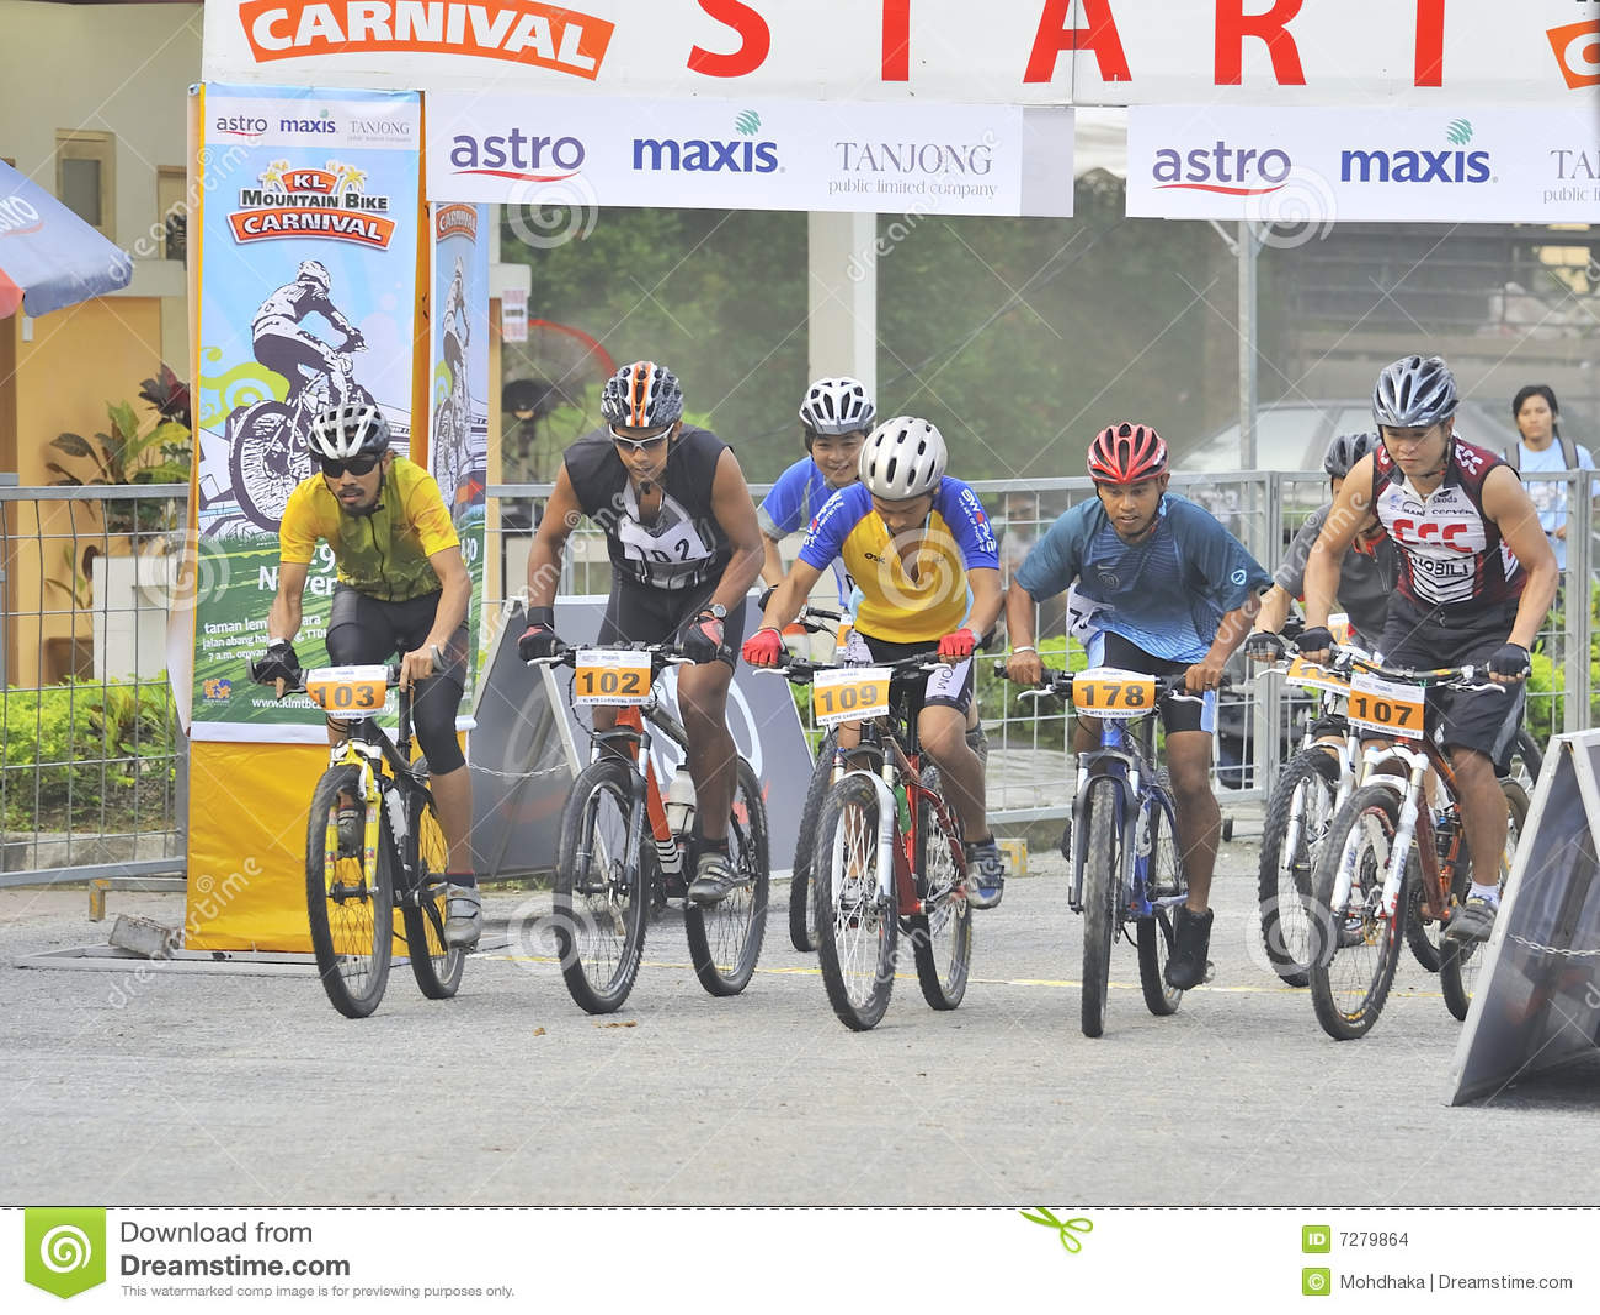 Línea de la raza de la bici de montaña al principio.